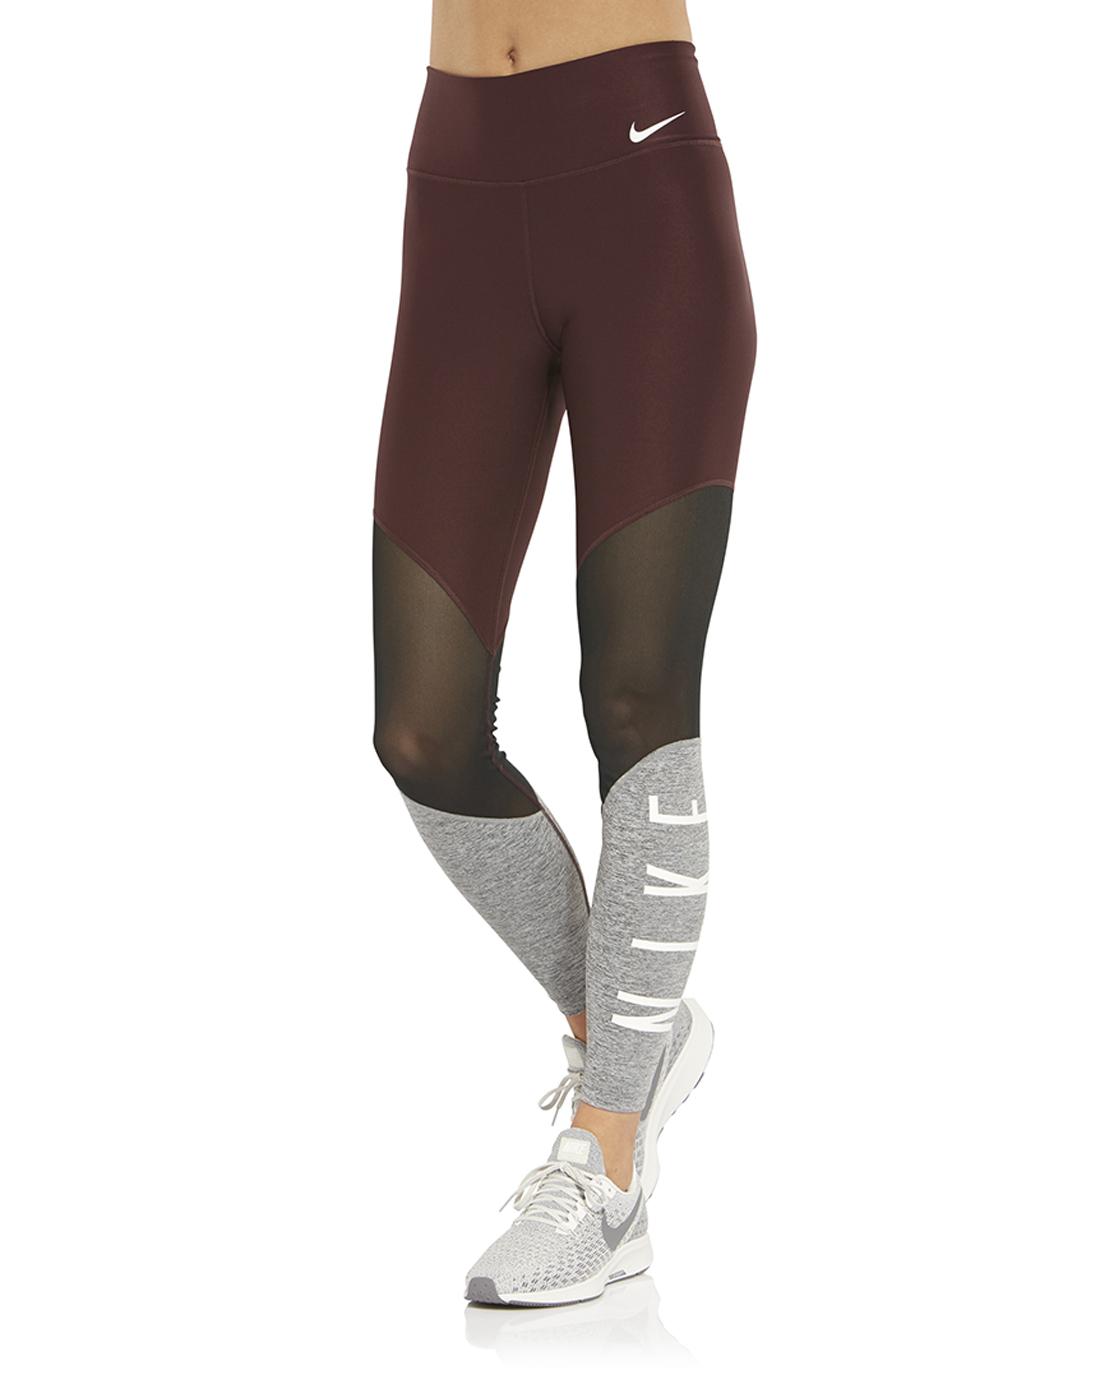 1cf63e964d0b9 Women's Burgundy Nike Mesh Gym Leggings | Life Style Sports